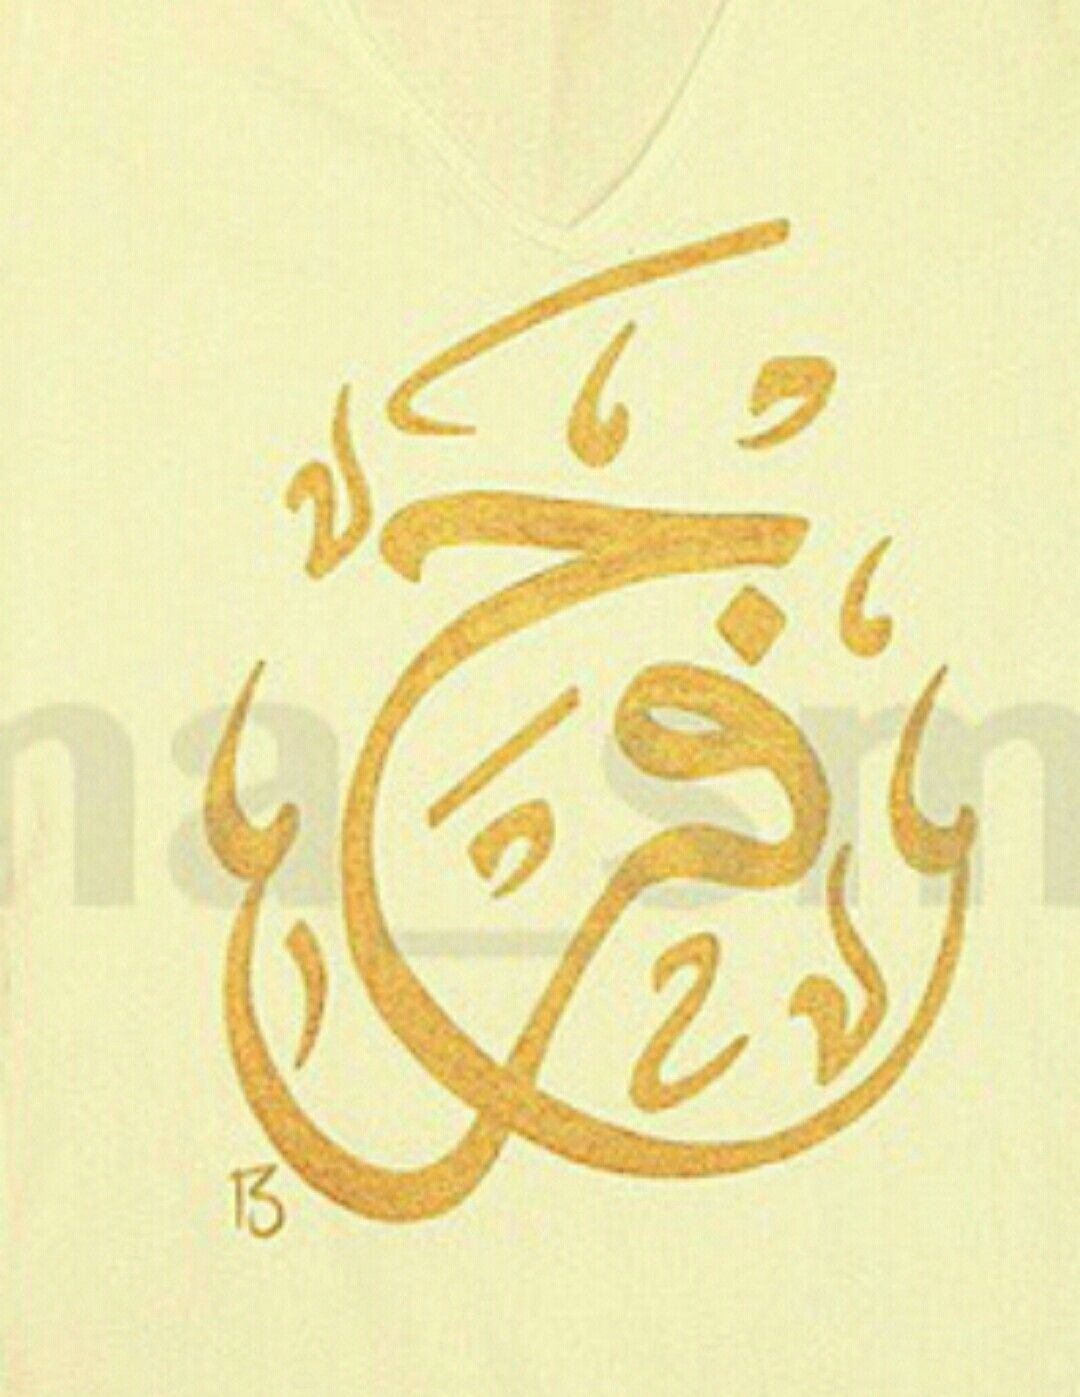 Pin By Nour Edward On Sufi Art Islamic Calligraphy Graffiti Lettering Calligraphy Art